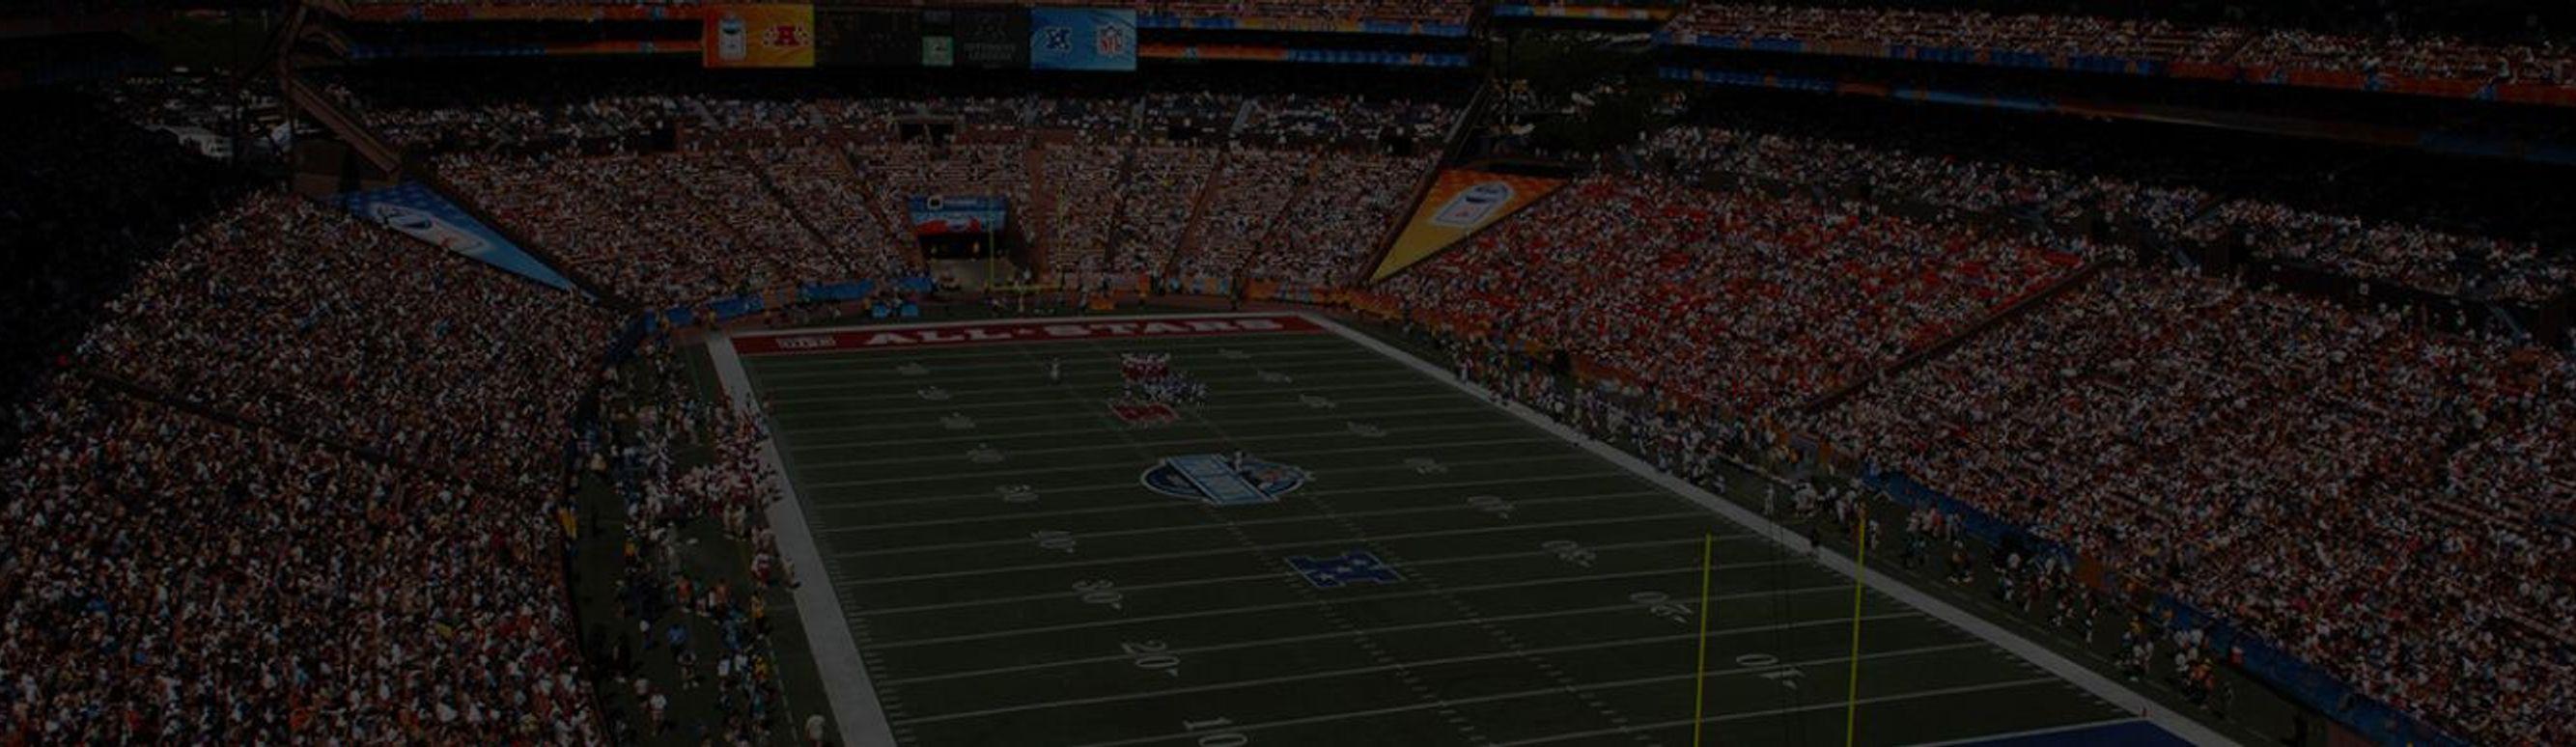 General view of Aloha Stadium